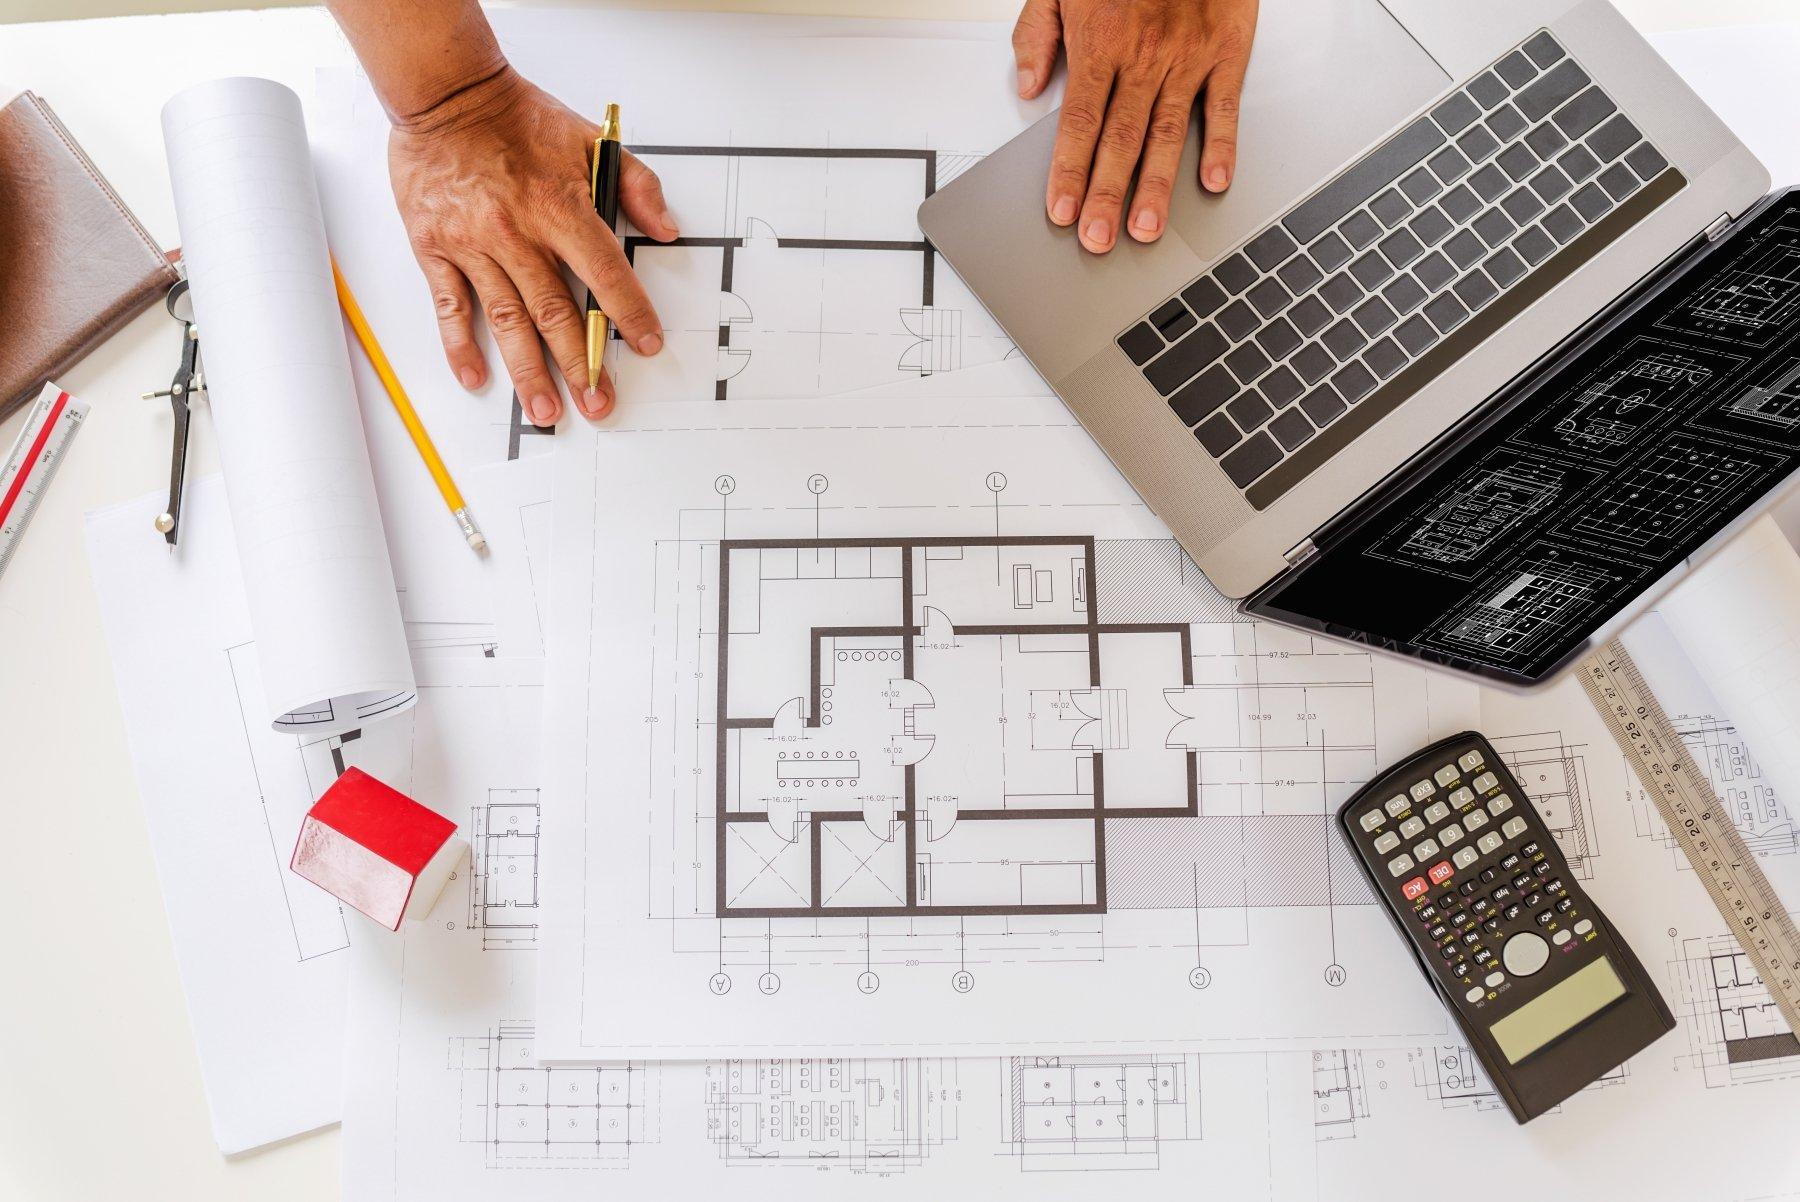 Blueprints for a custom built residential home